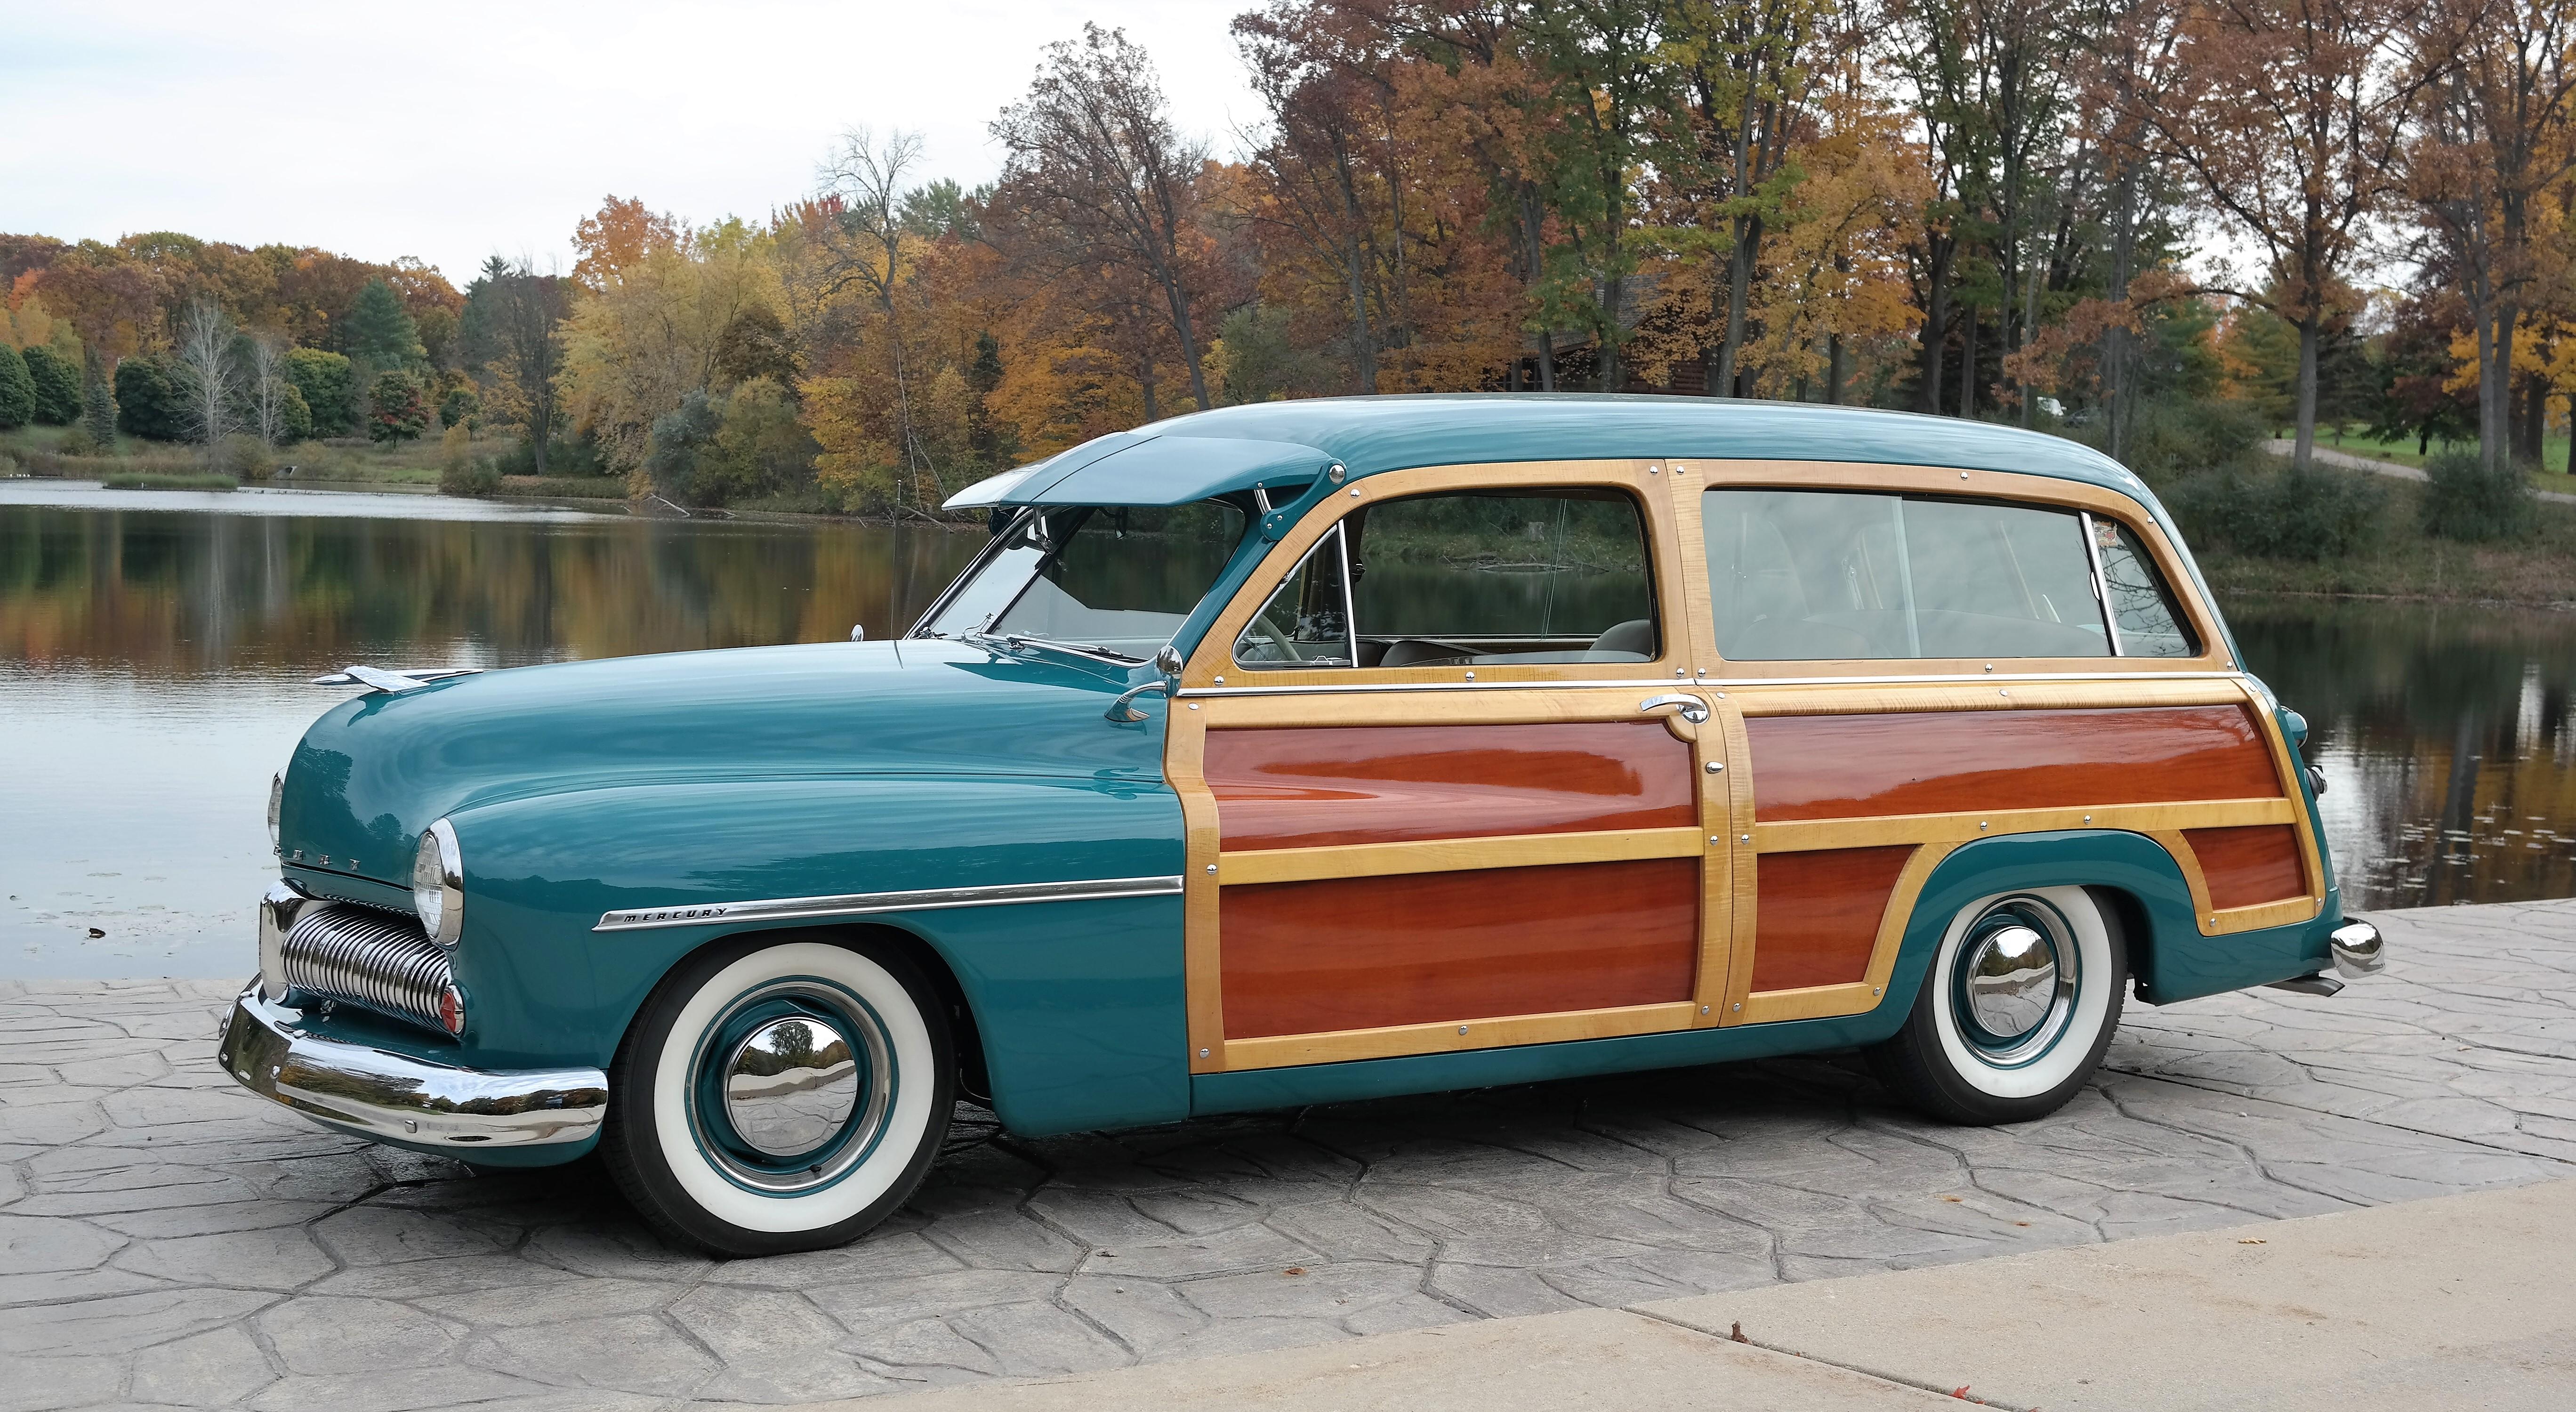 Midwest Classic Restorations & Bodyworks – 920-277-2373